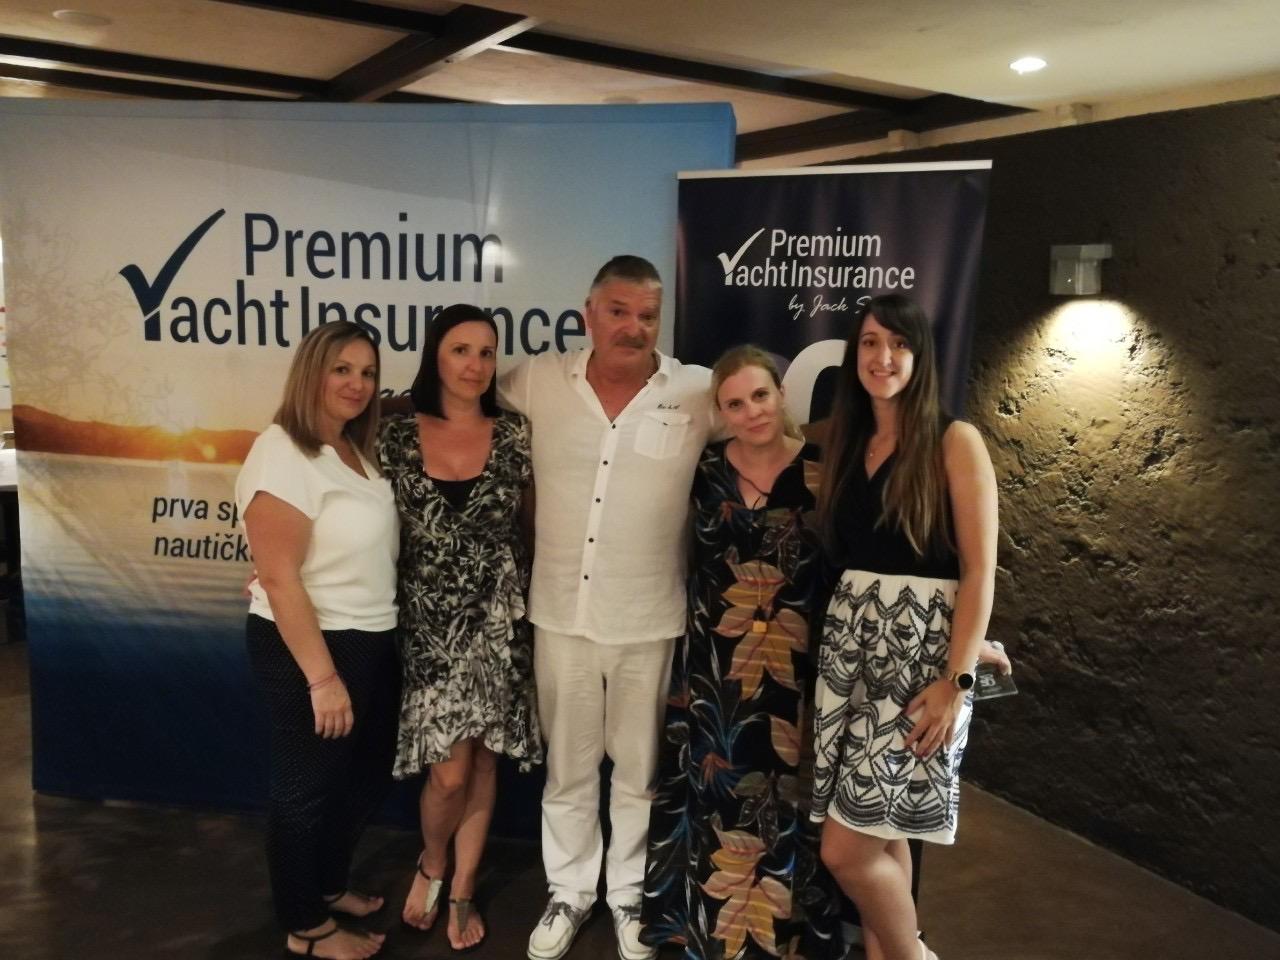 Proslava 25. obljetnice Premium Yacht Insurance by Đek Šurija